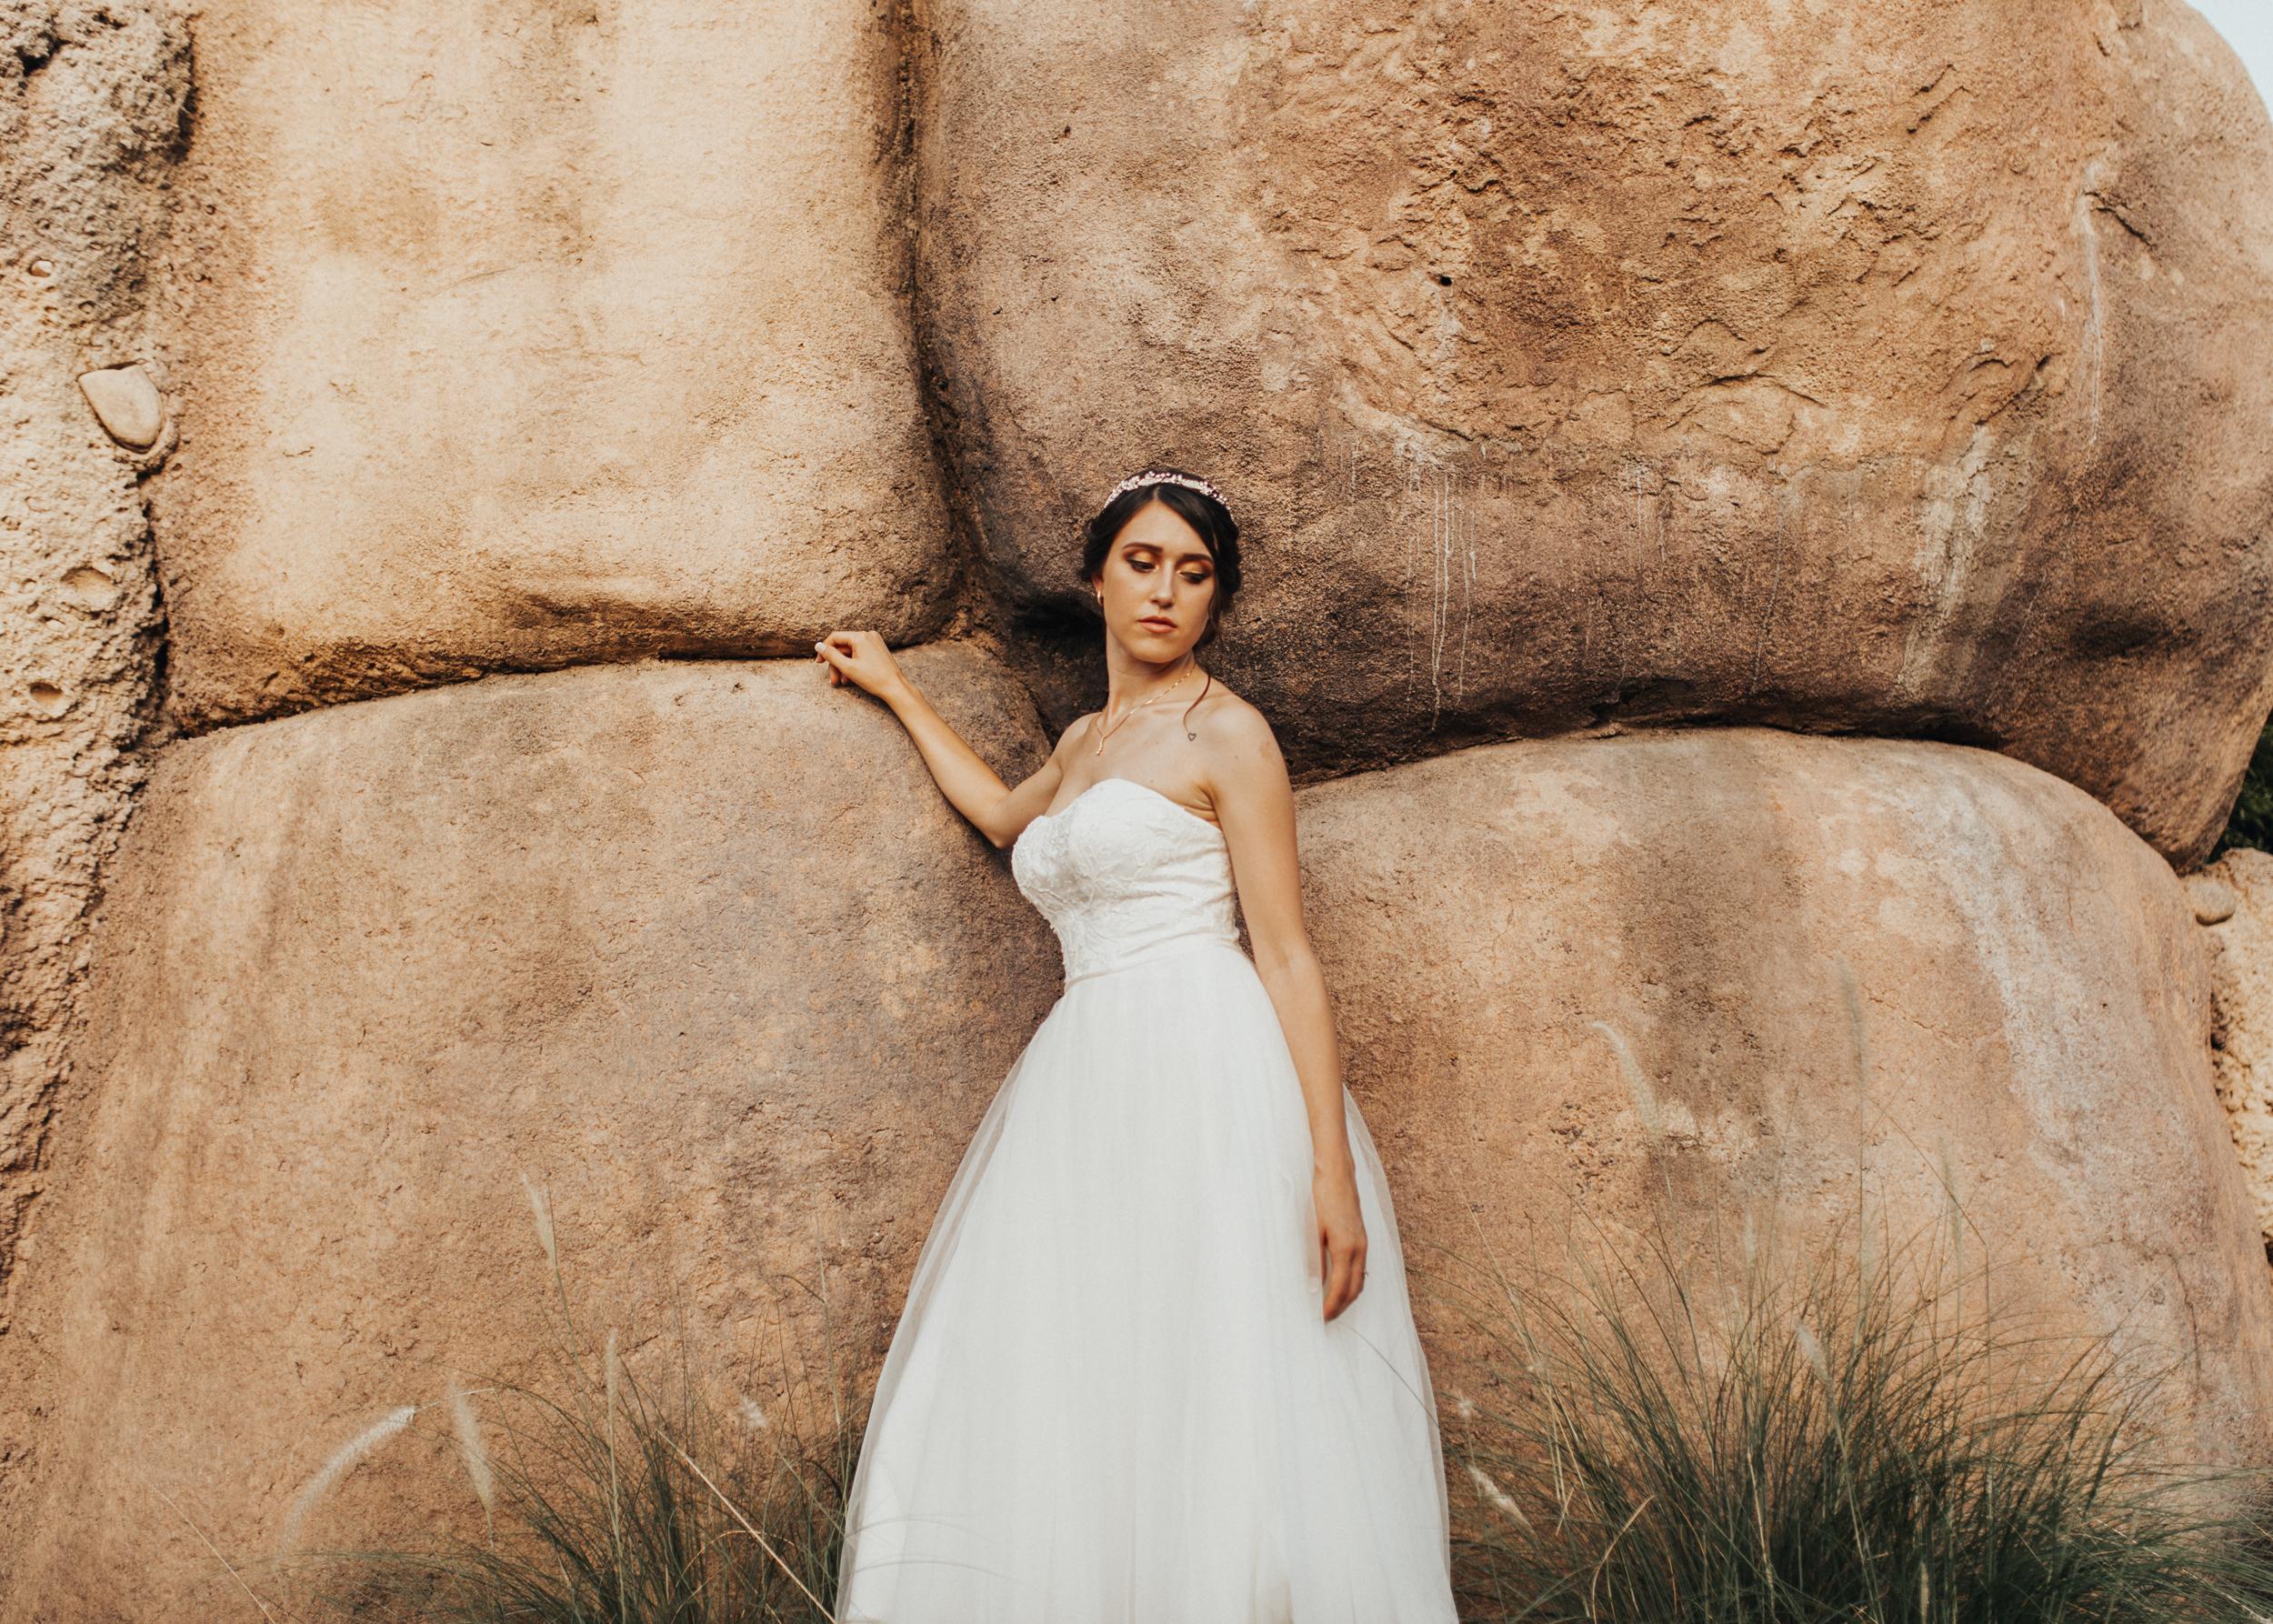 L'Cee_Bridal-119.jpg